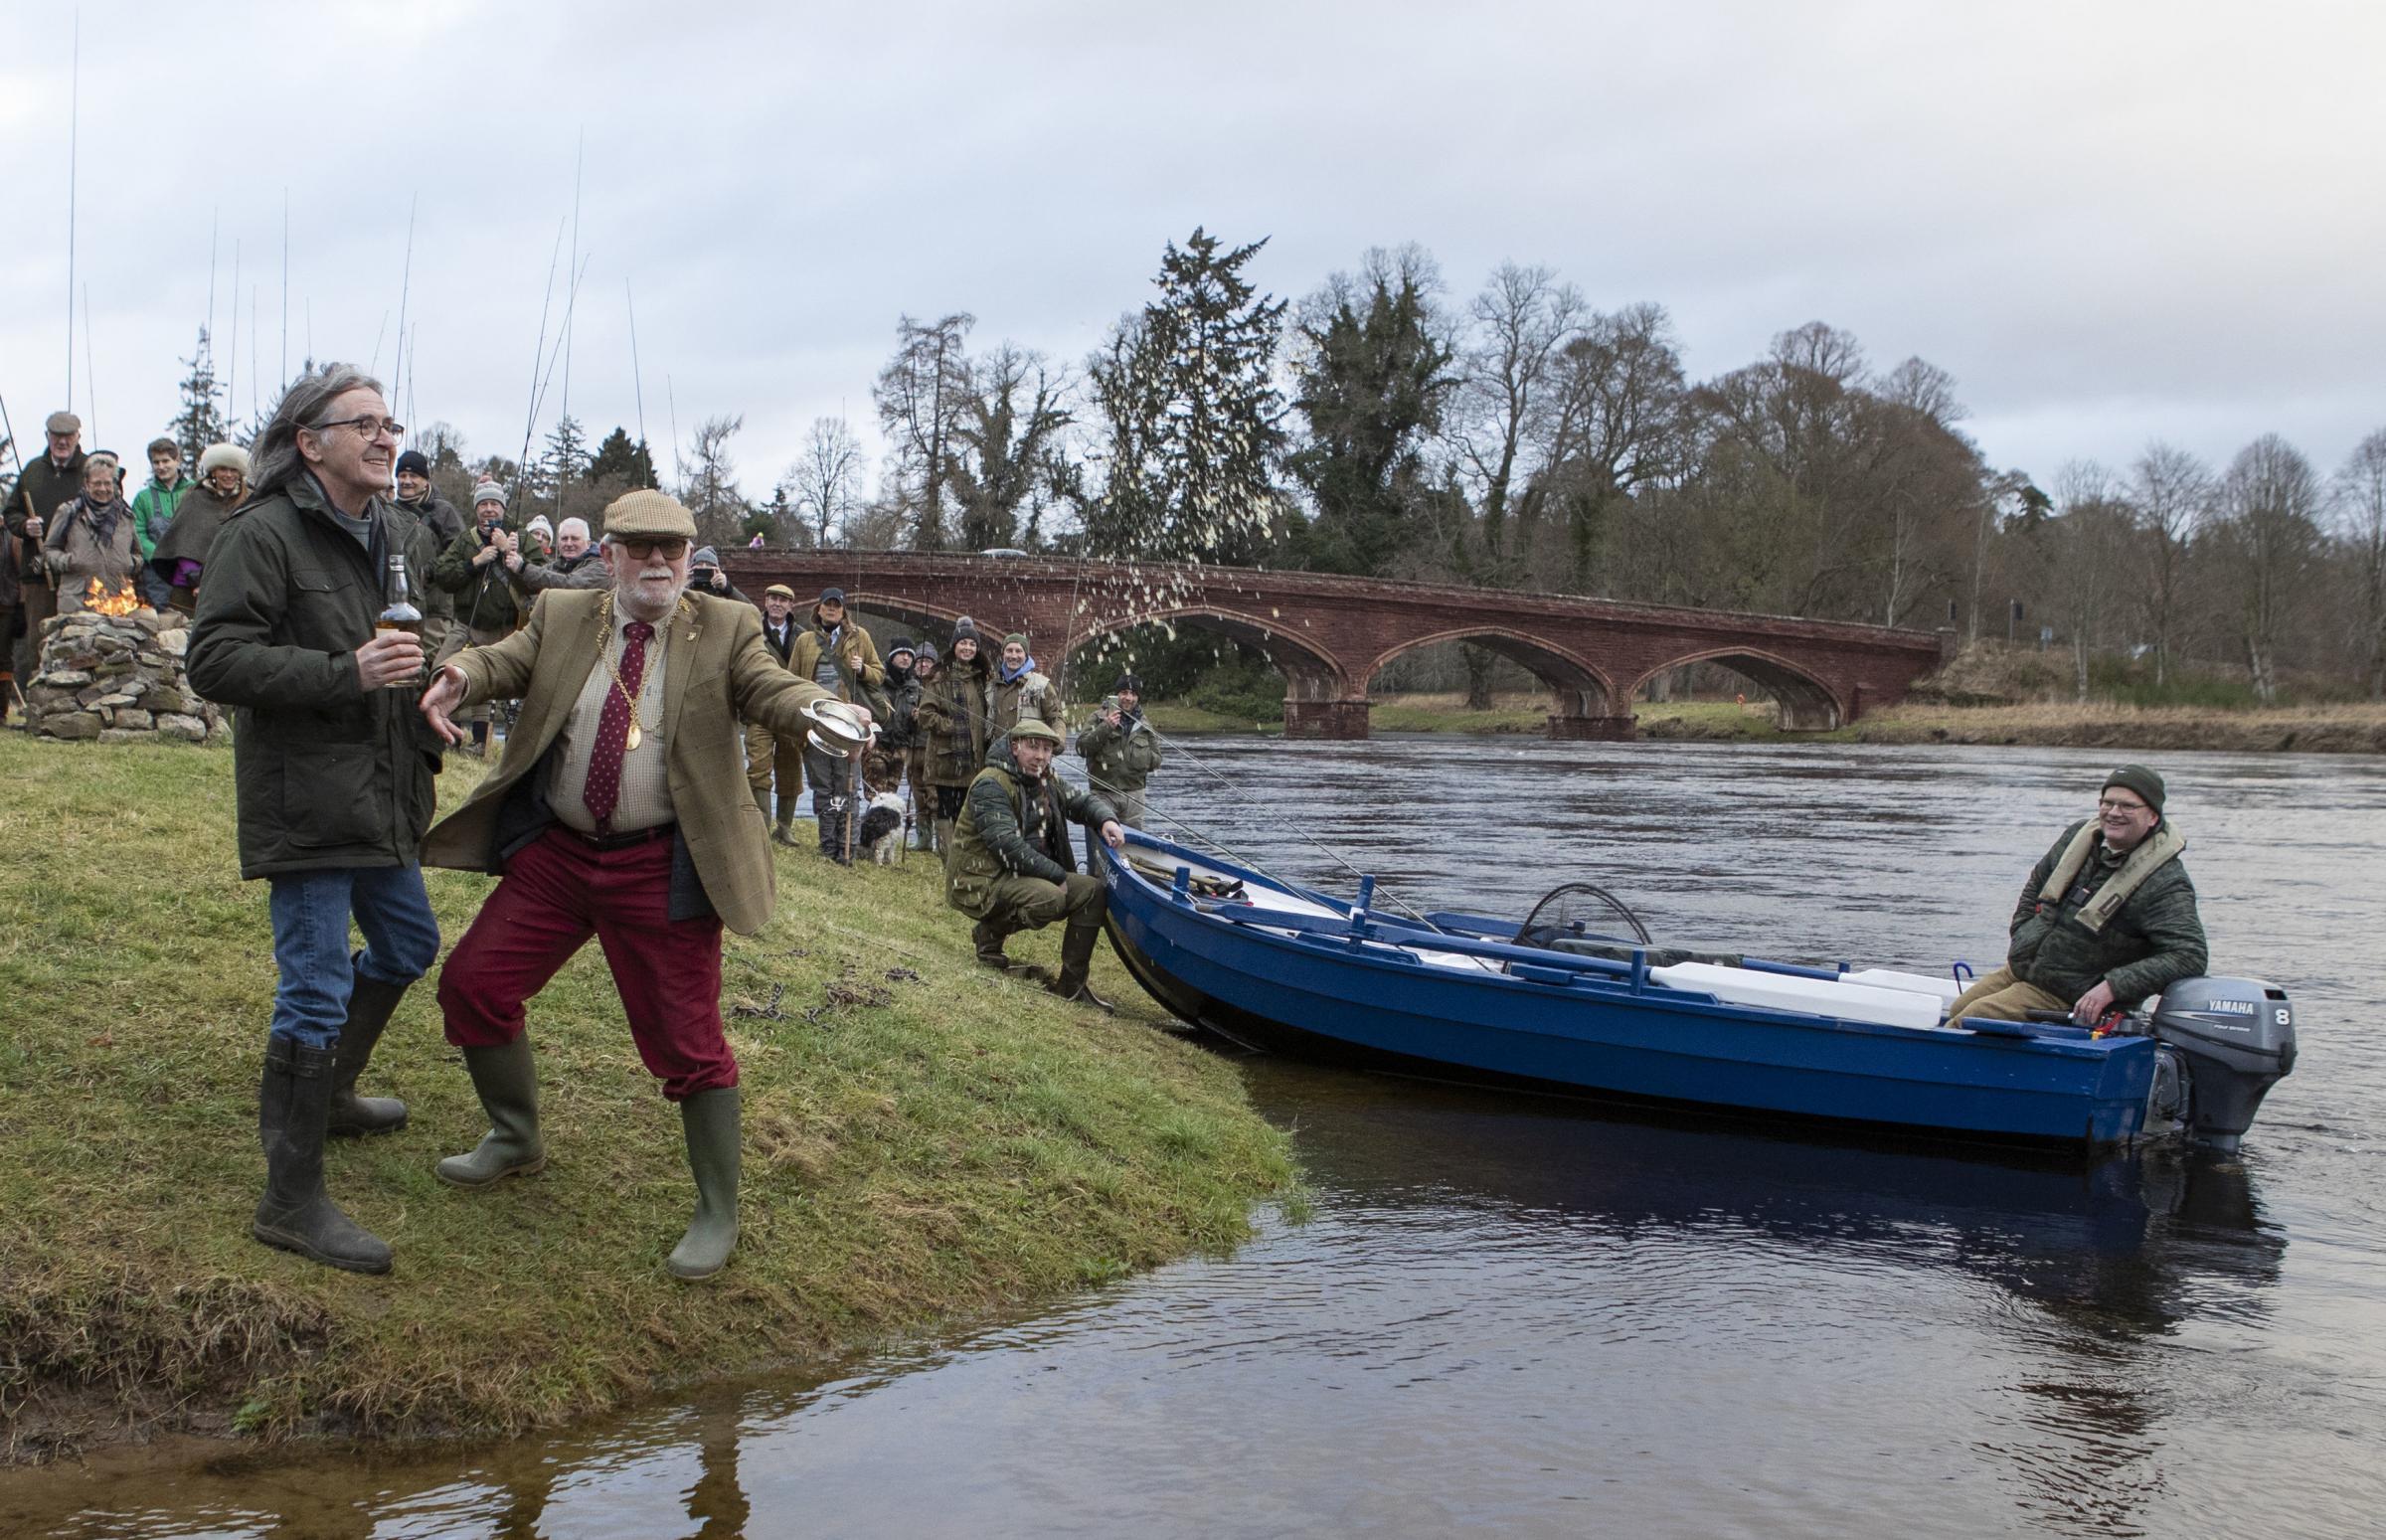 Dougie MacLean blesses River Tay for salmon fishing season